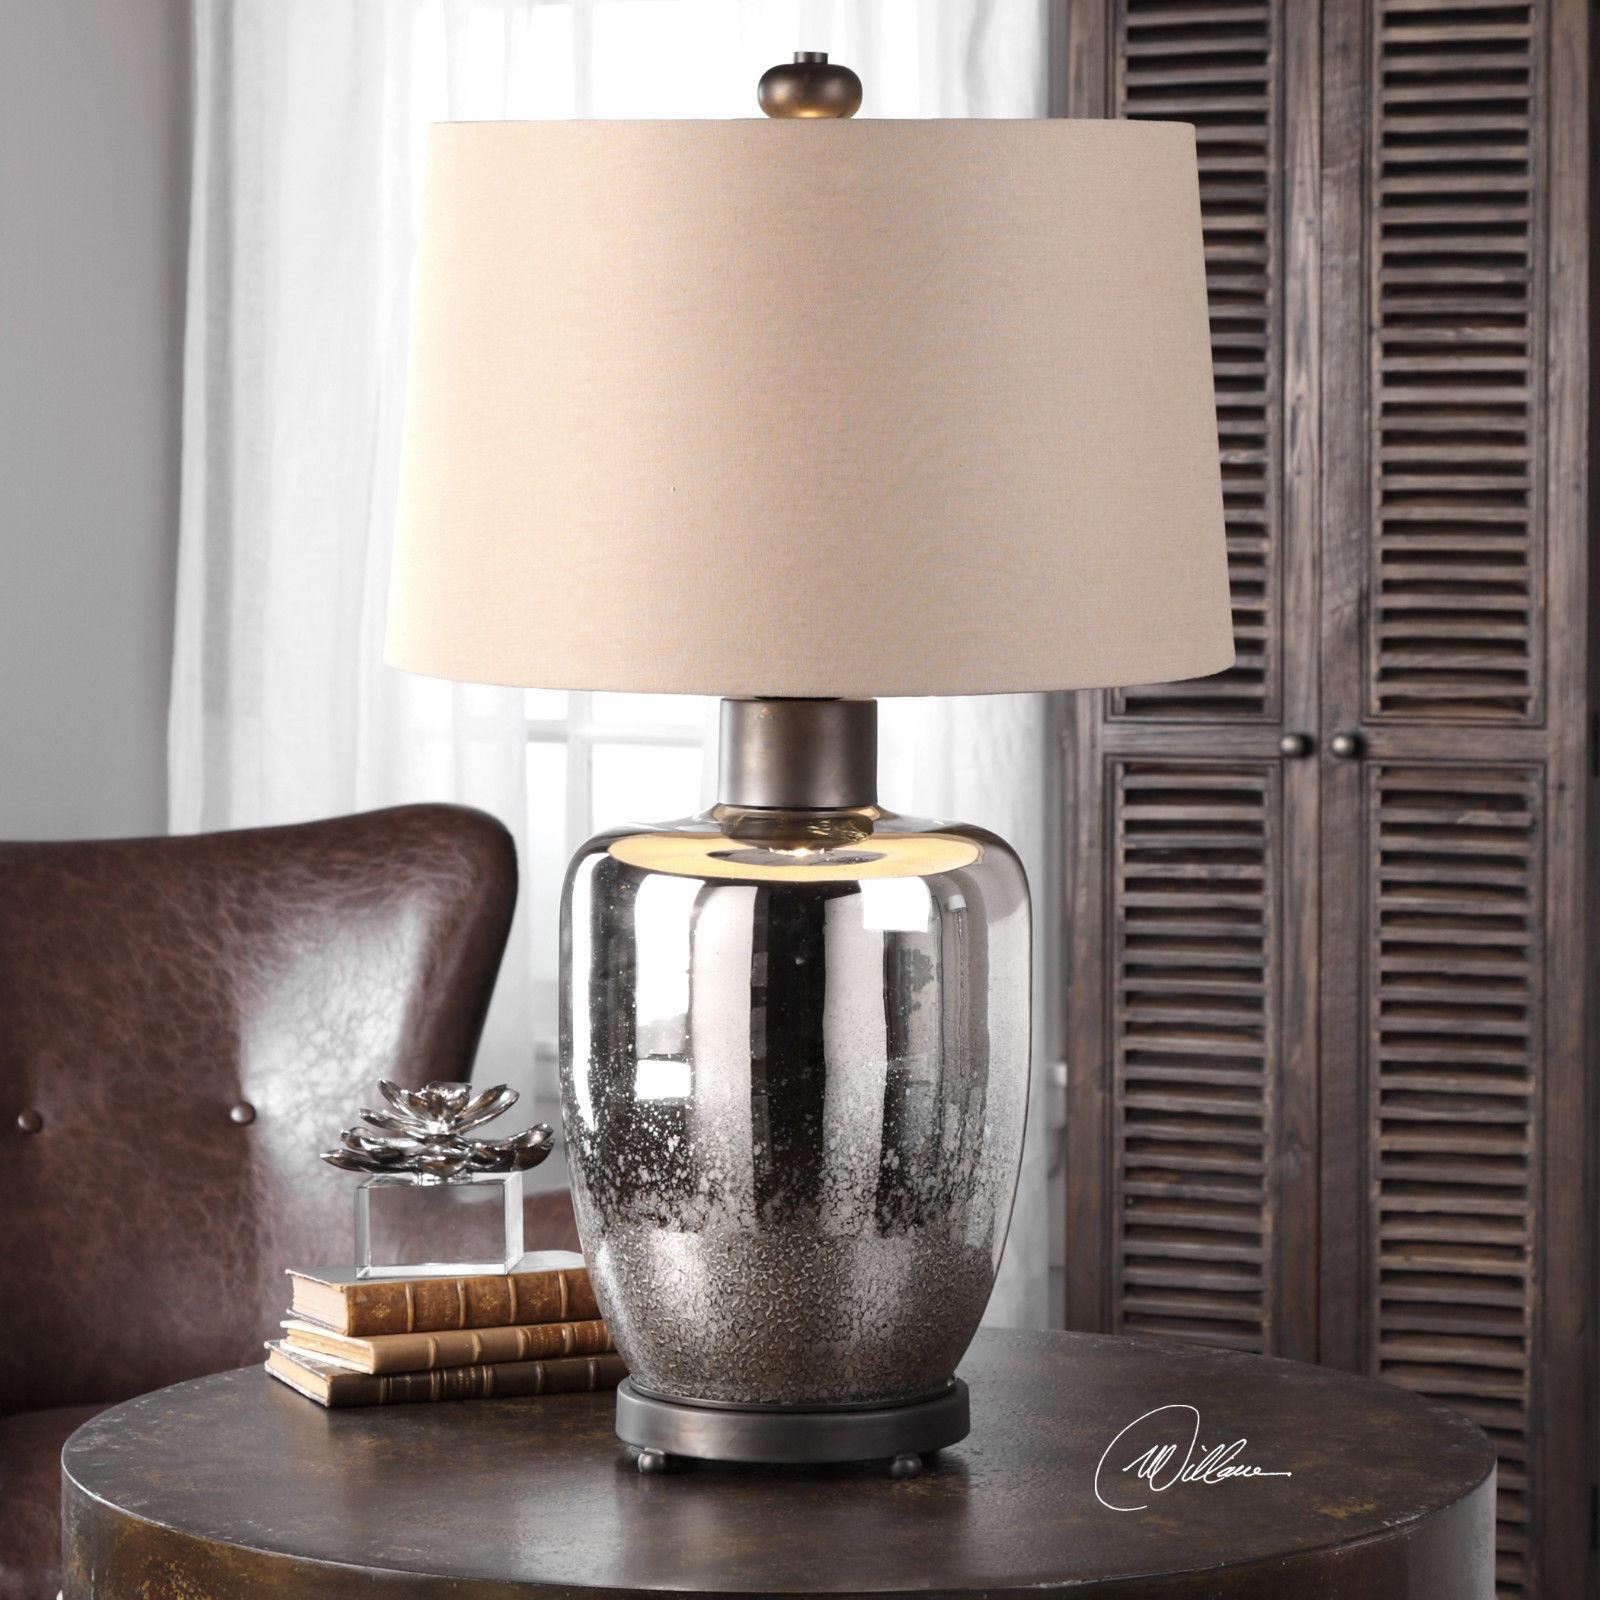 "PAIR DESIGNER 32"" AGED MERCURY GLASS TABLE LAMP OXIDIZED BRONZE METAL"